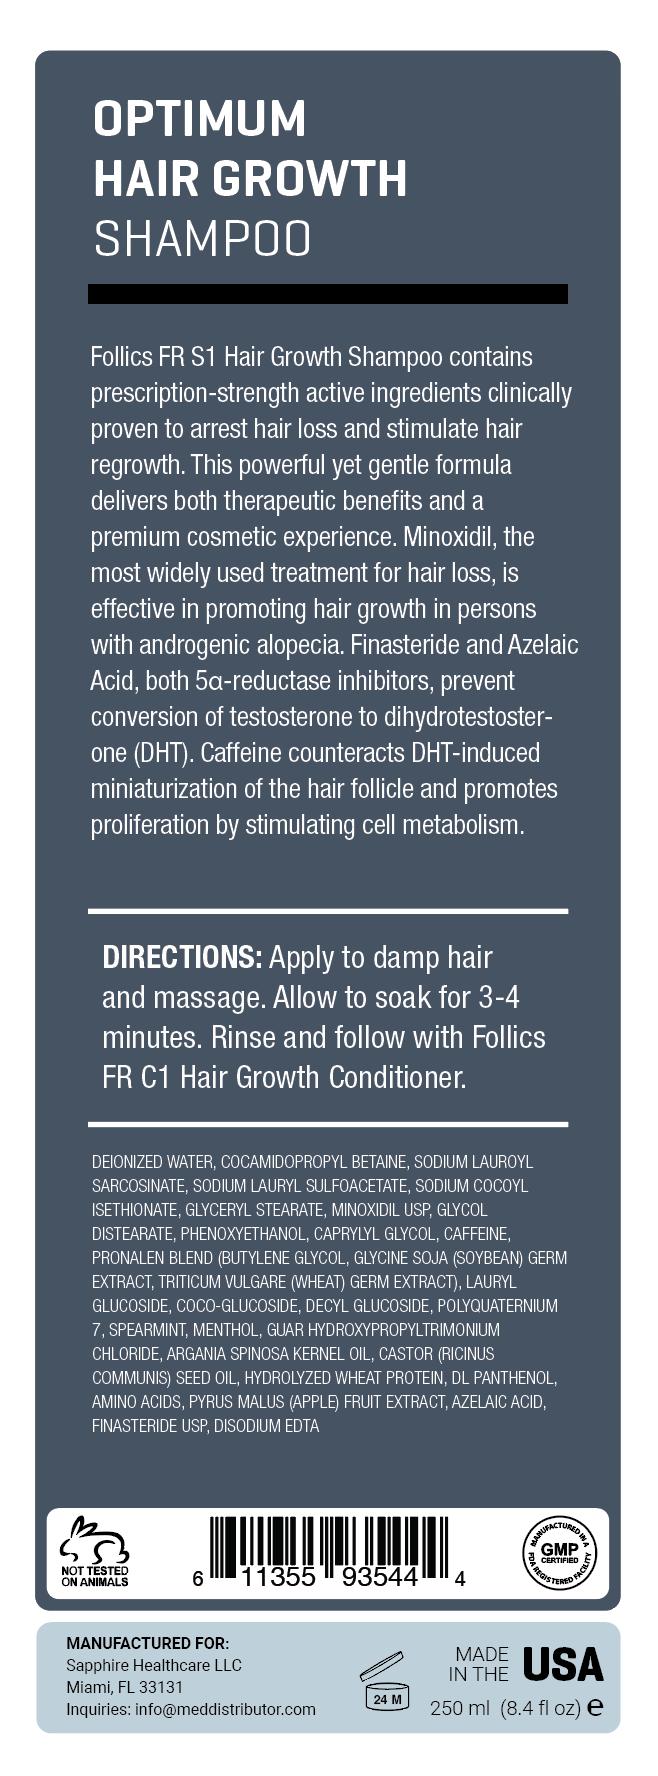 Fr S1 Shampoo Follics